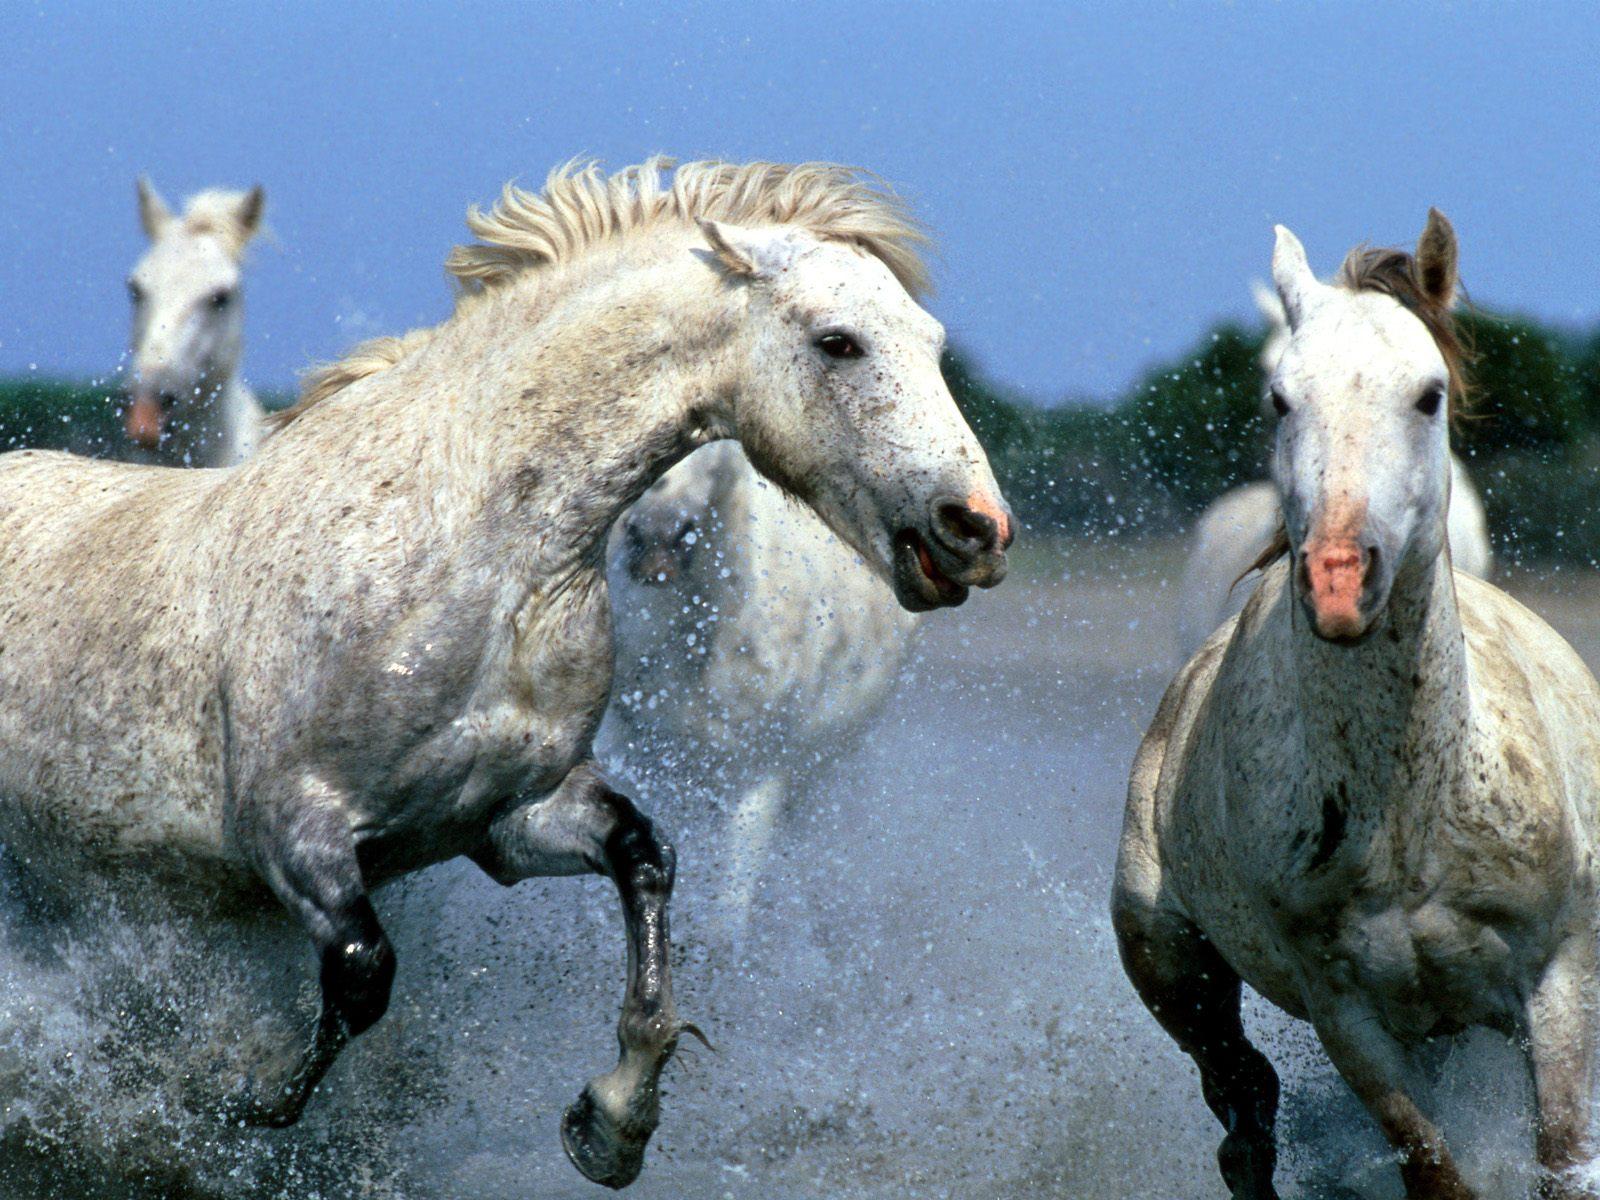 Best Wallpaper Horse Water - the-best-top-desktop-horse-wallpapers-30  You Should Have_705795.jpg